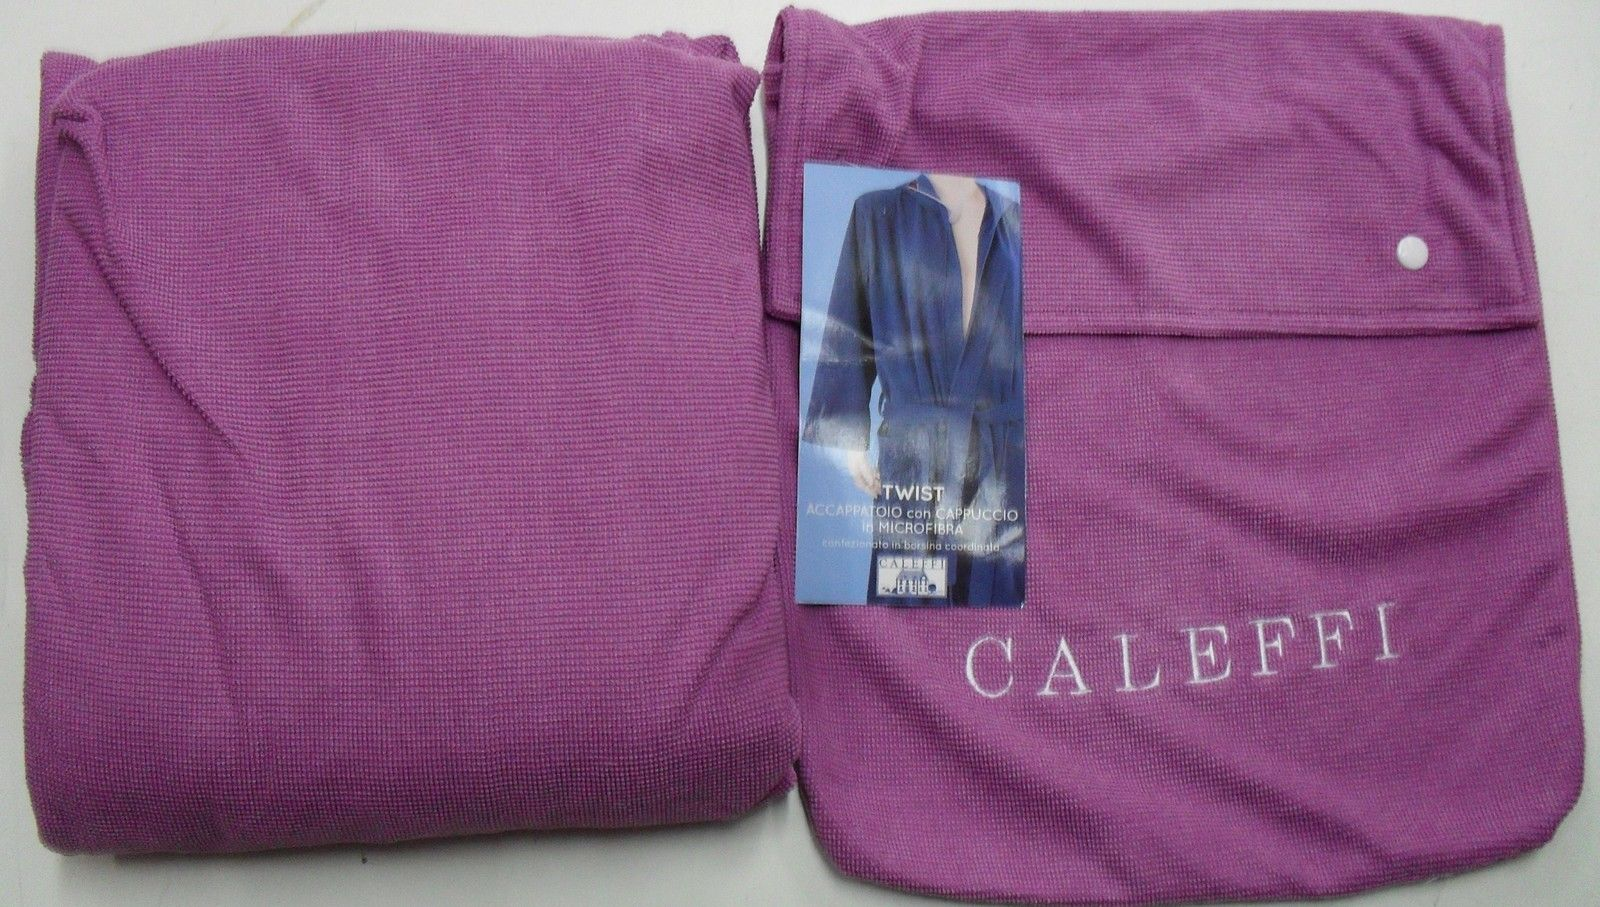 Spugne Da Bagno Caleffi : Caleffi accappatoio in vendita ebay